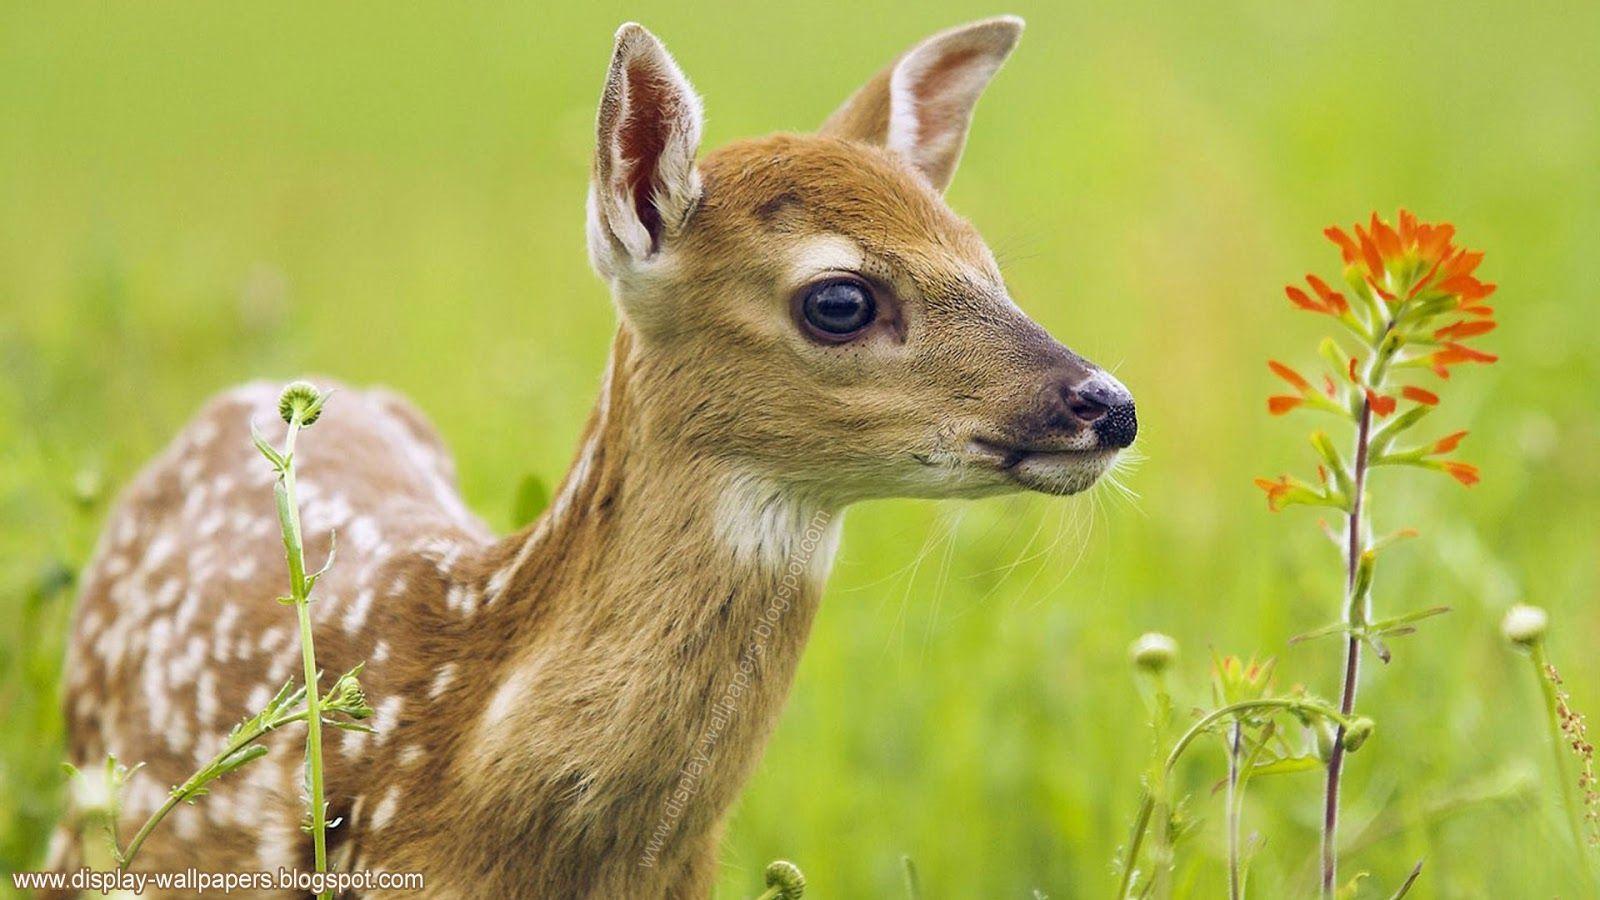 Wallpapers Download Animals Wallpaper Hd 1080p Animal Pictures Animals Images Animal Wallpaper